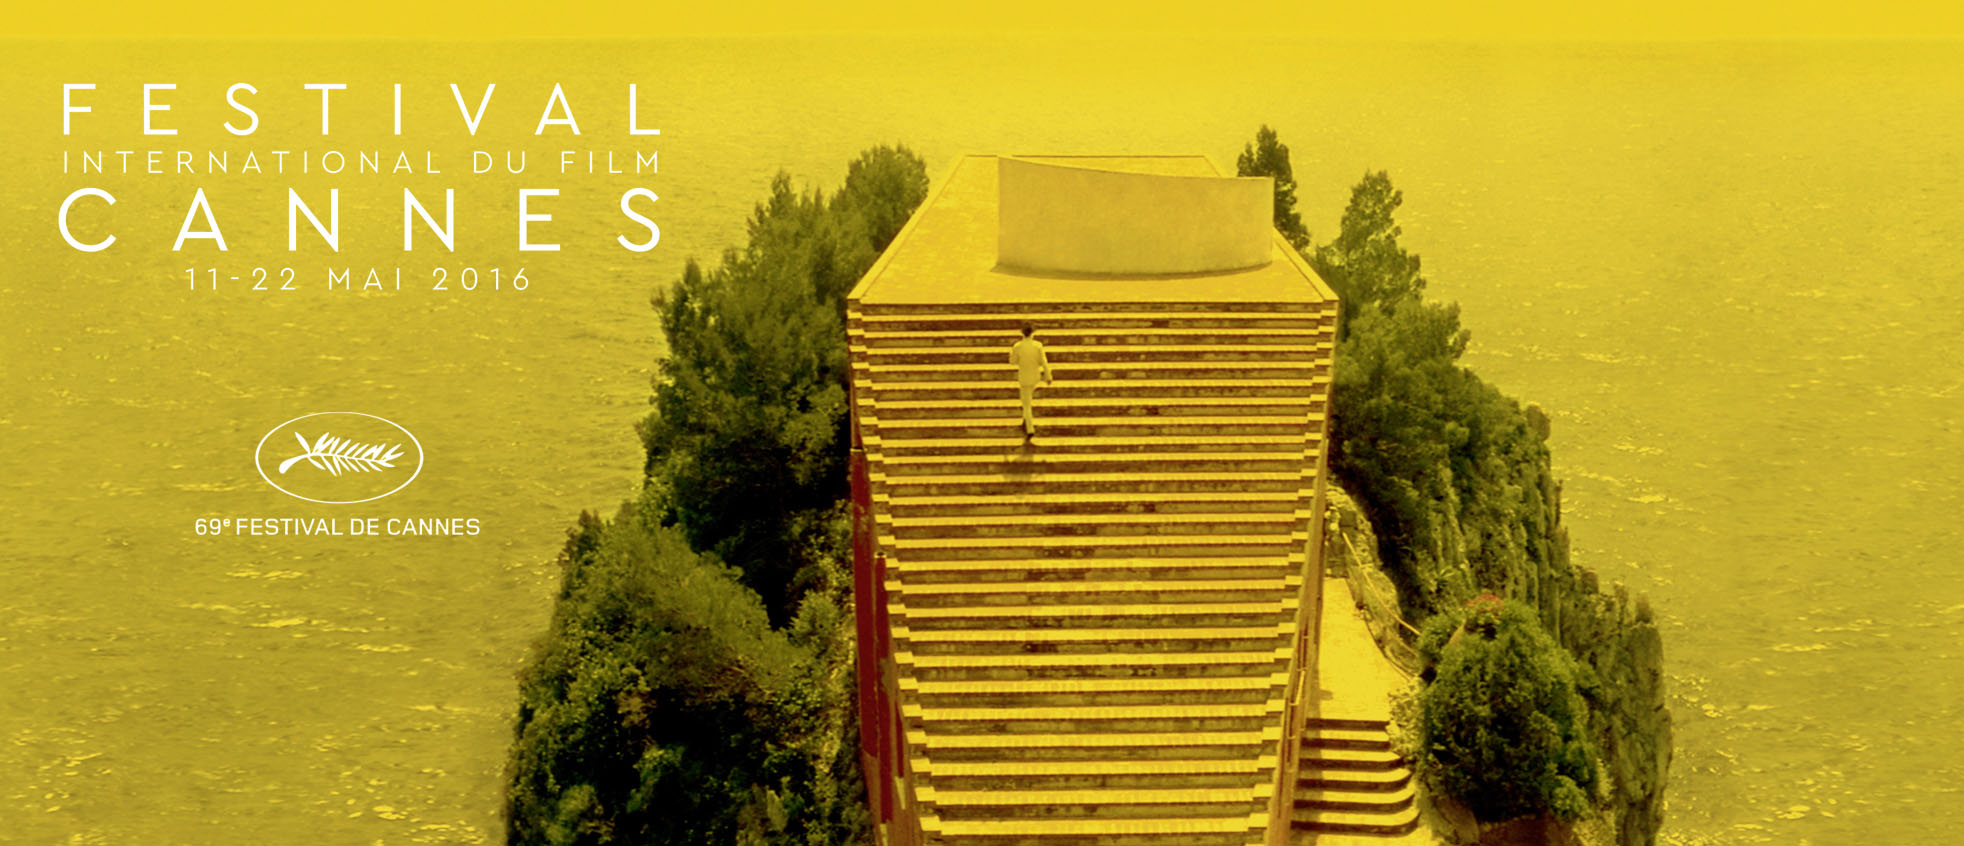 Cannes-festivalen 2016